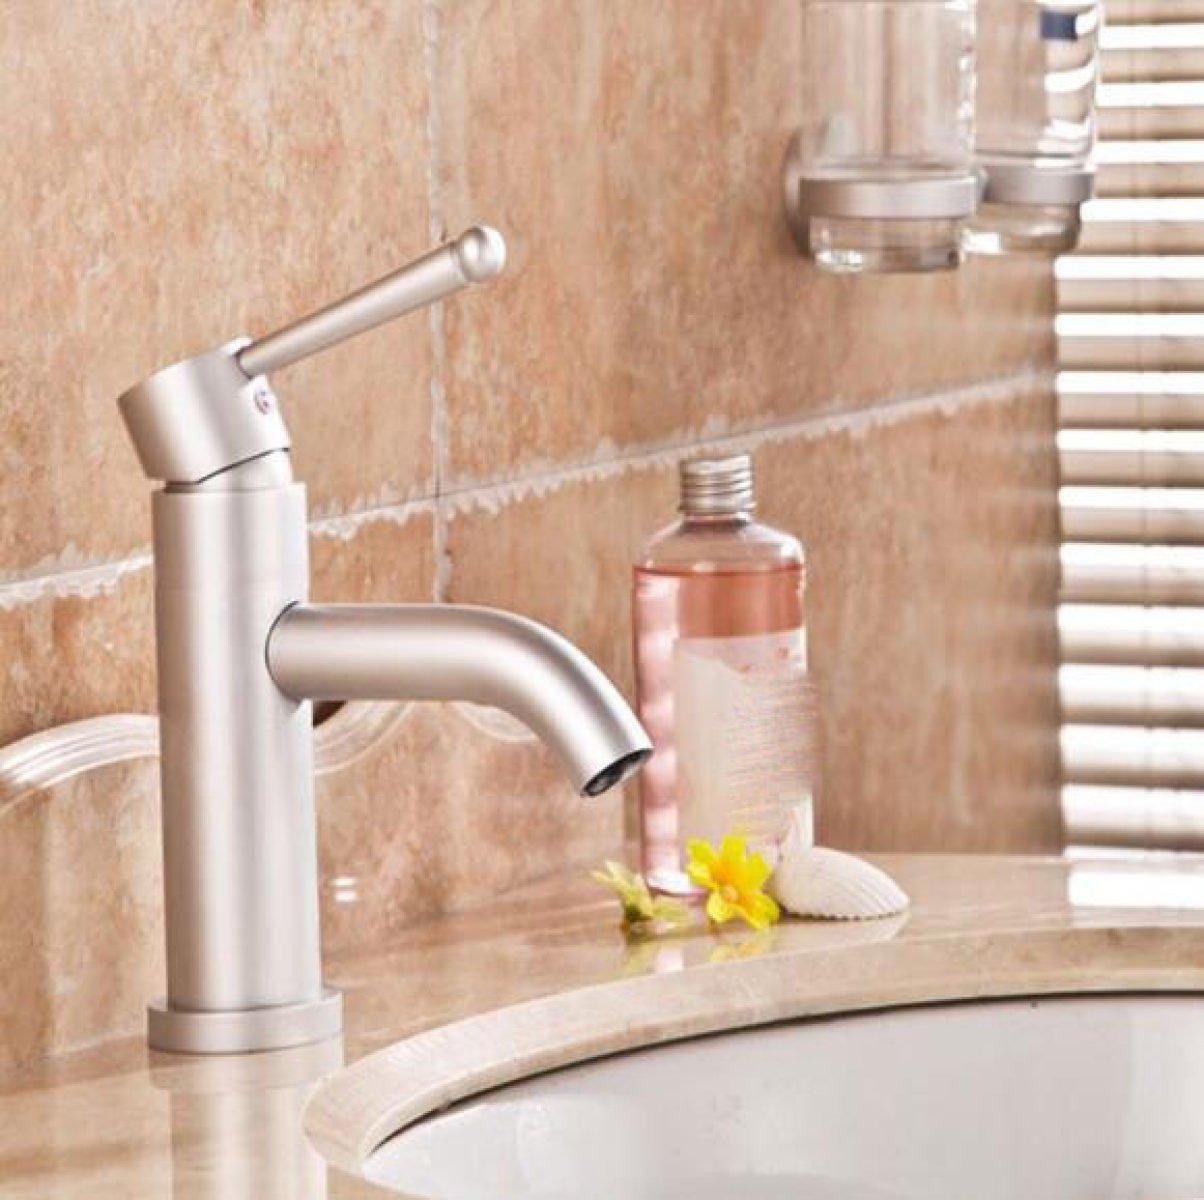 LDONGSH Space Aluminum Basin Basin Lead Free Bathroom Bathroom Faucet Tap